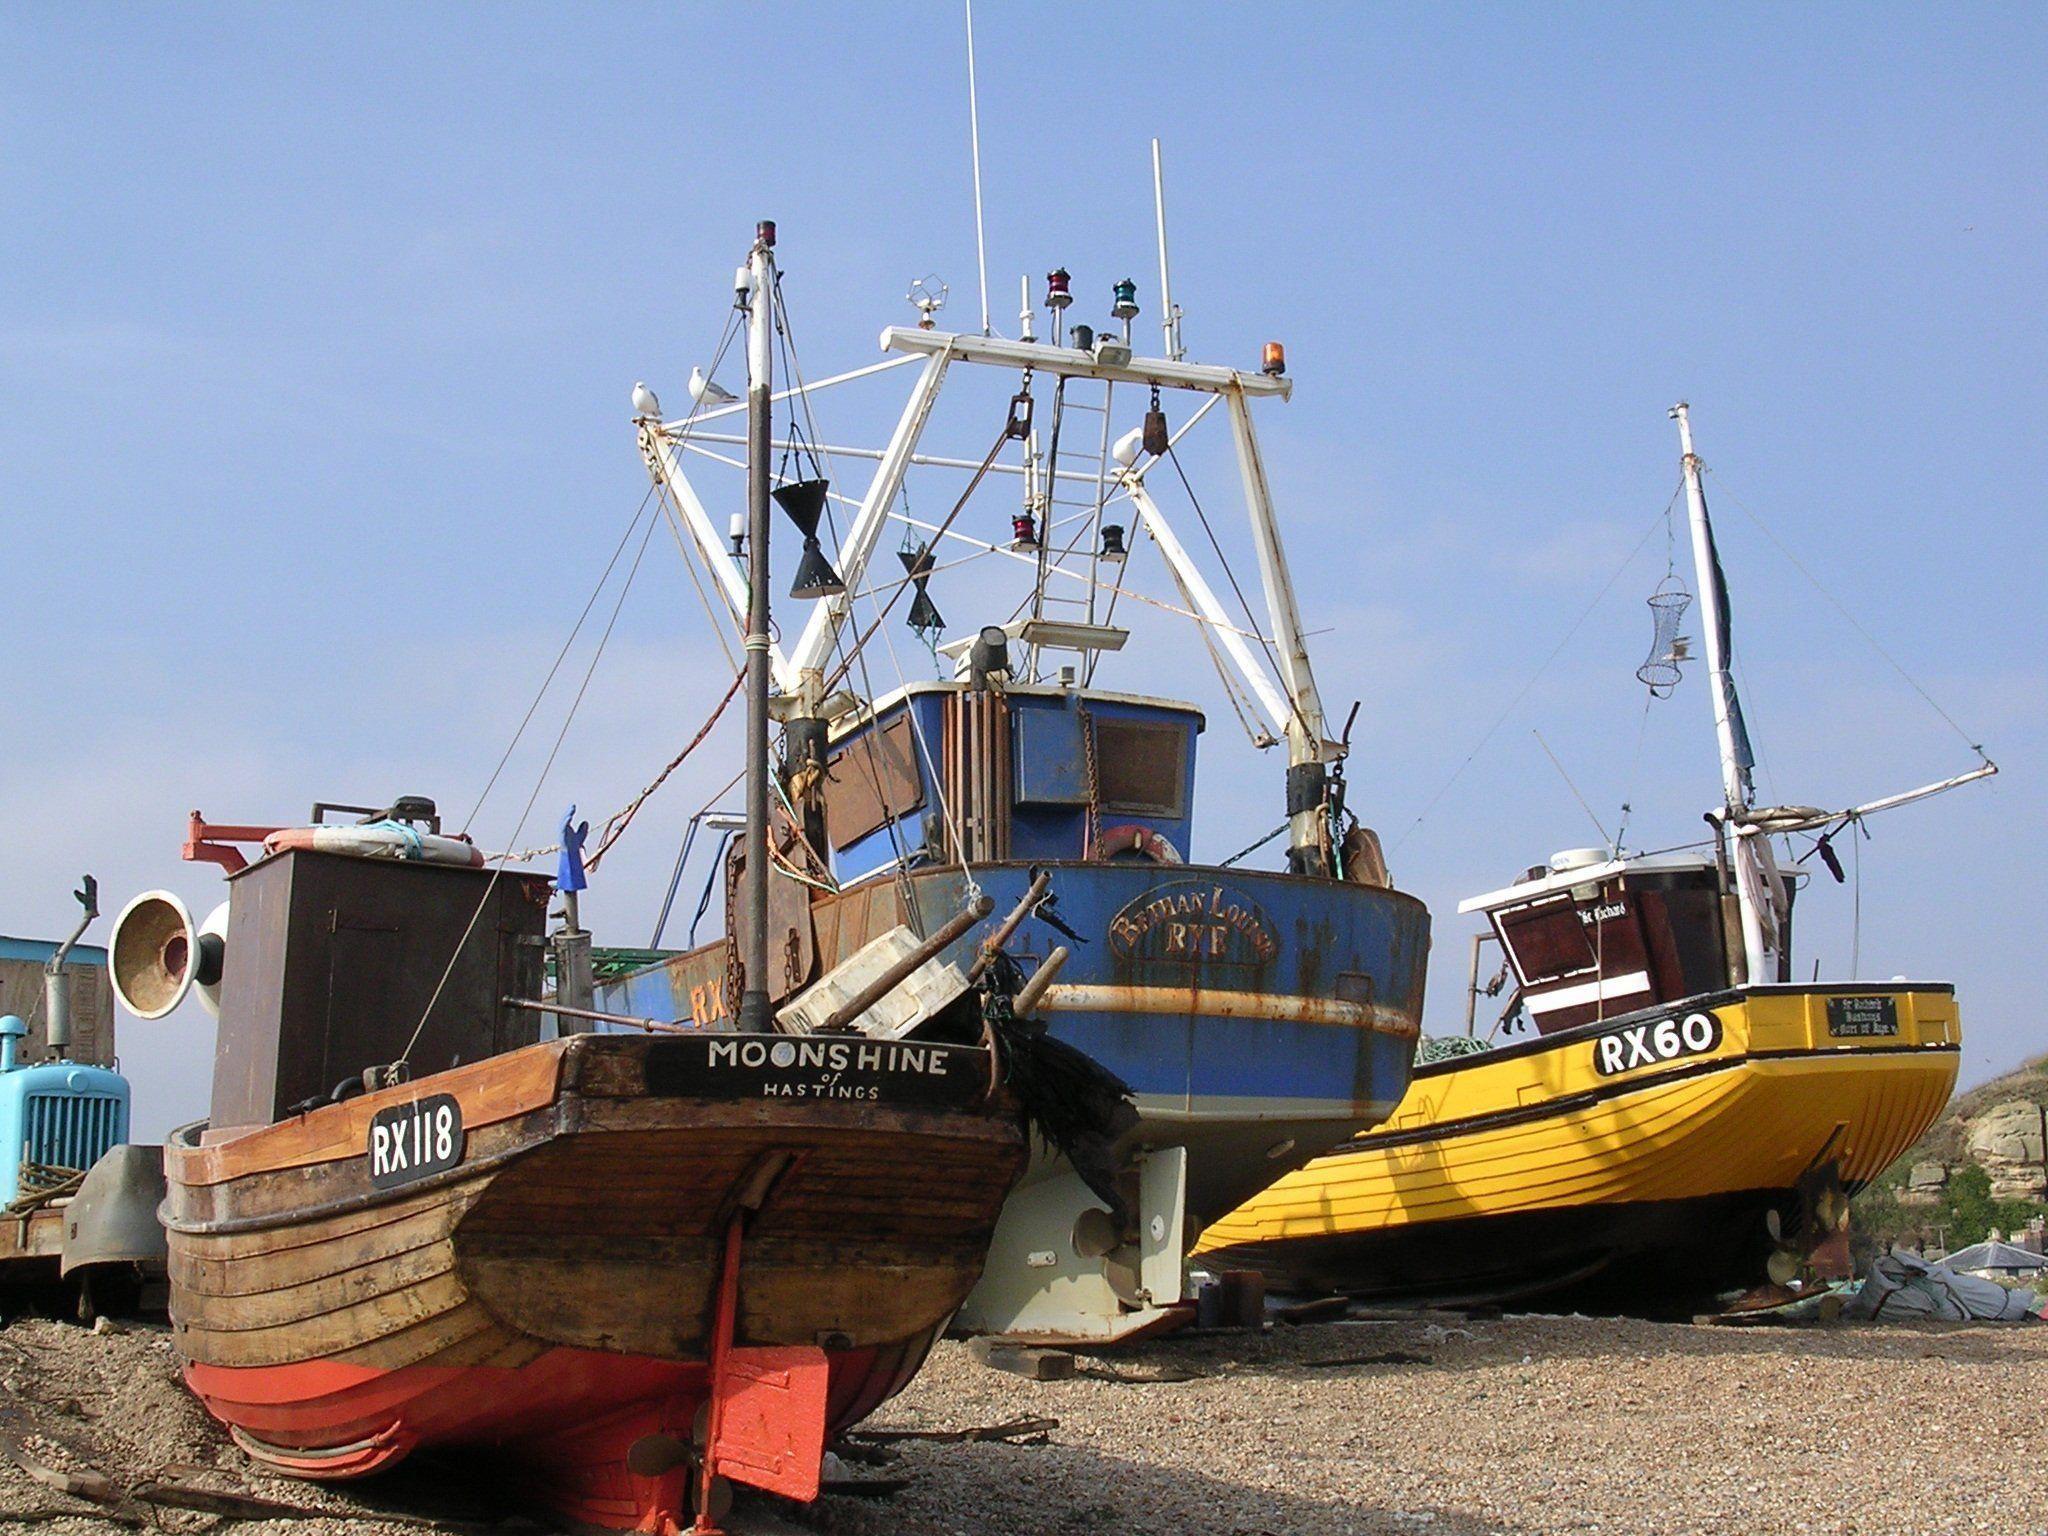 Fresh Based What Boat